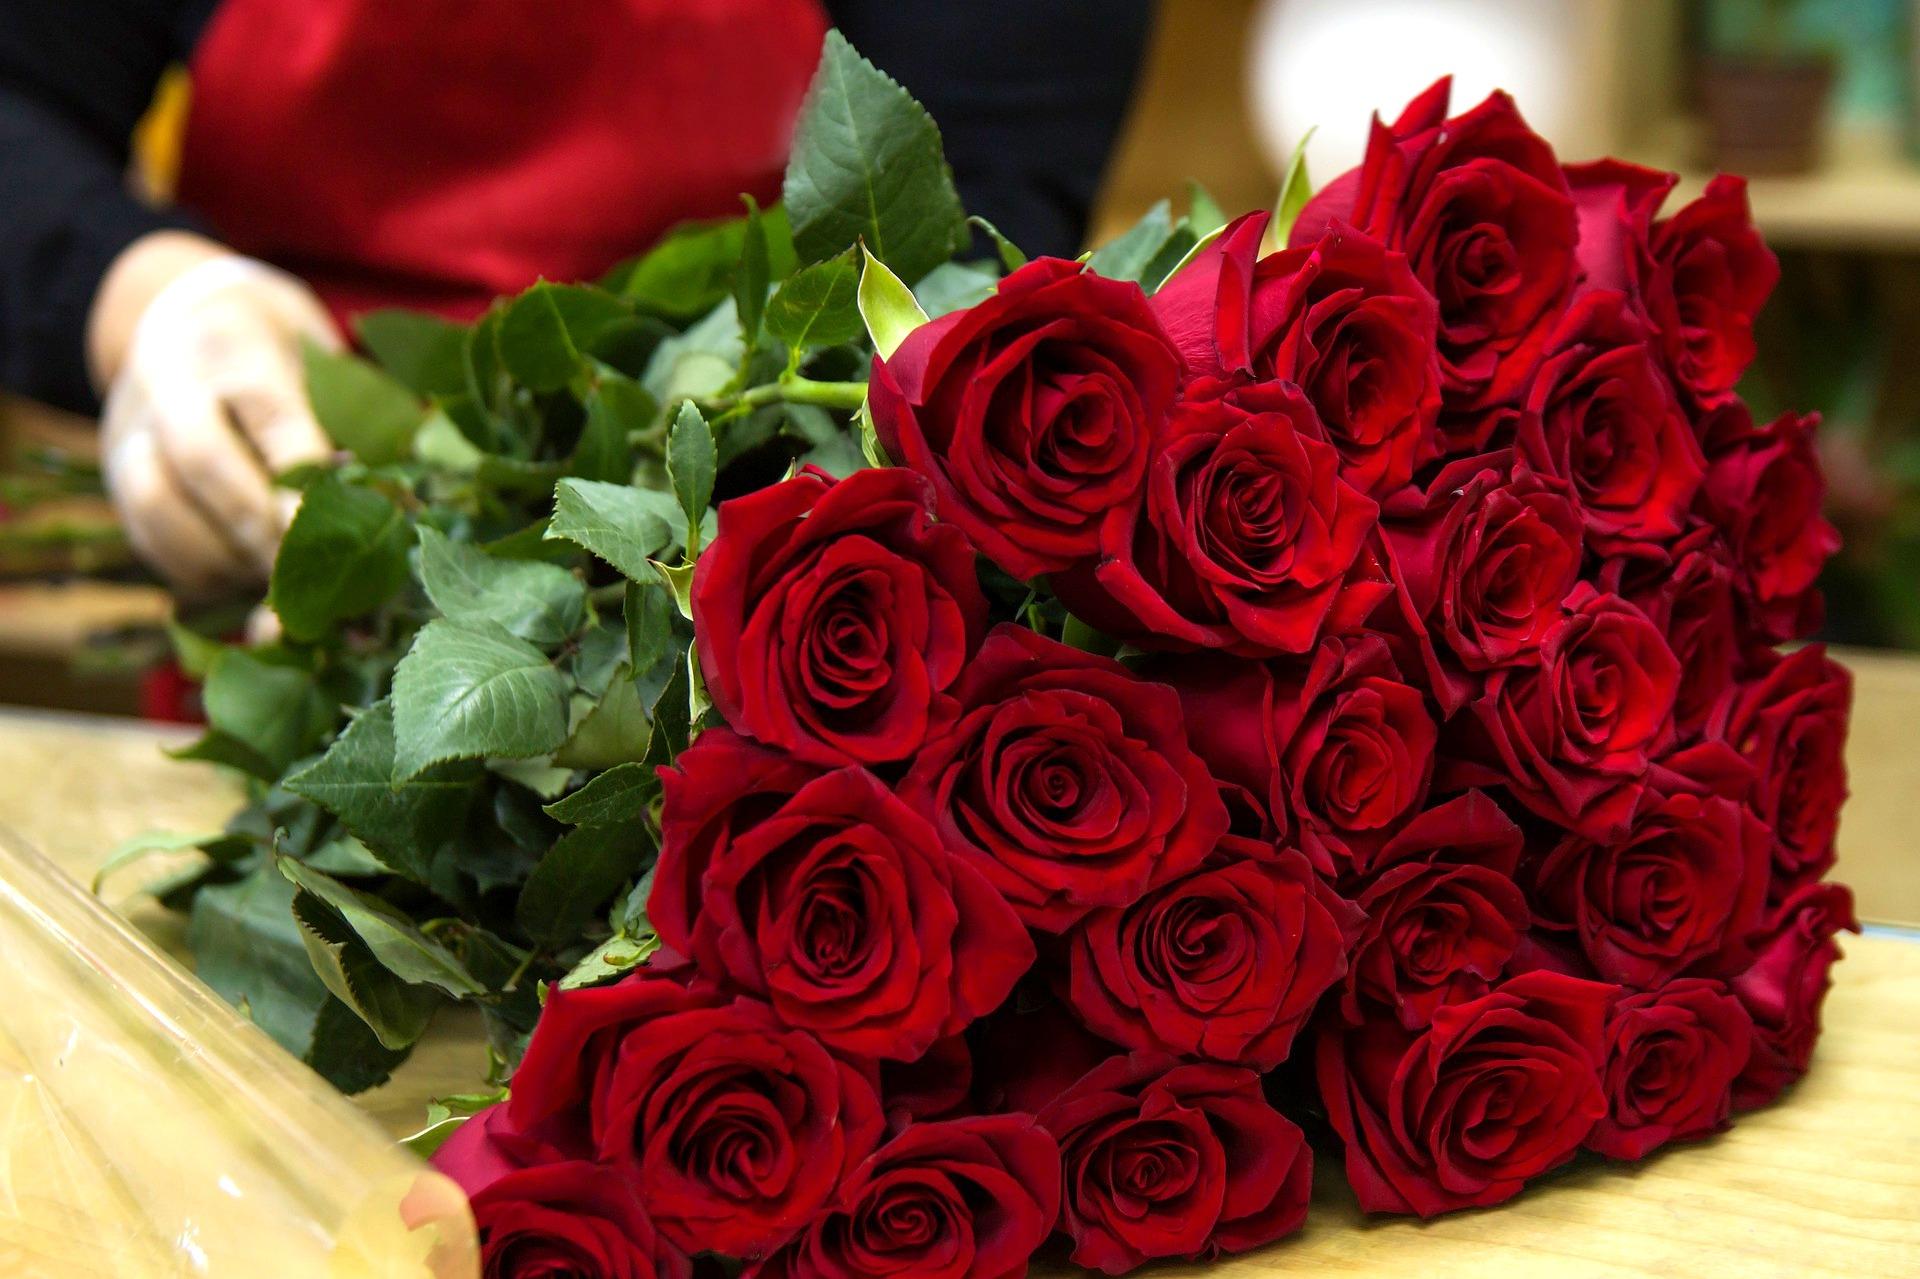 Cum pastrezi un buchet de trandafiri cat mai mult timp in vaza?